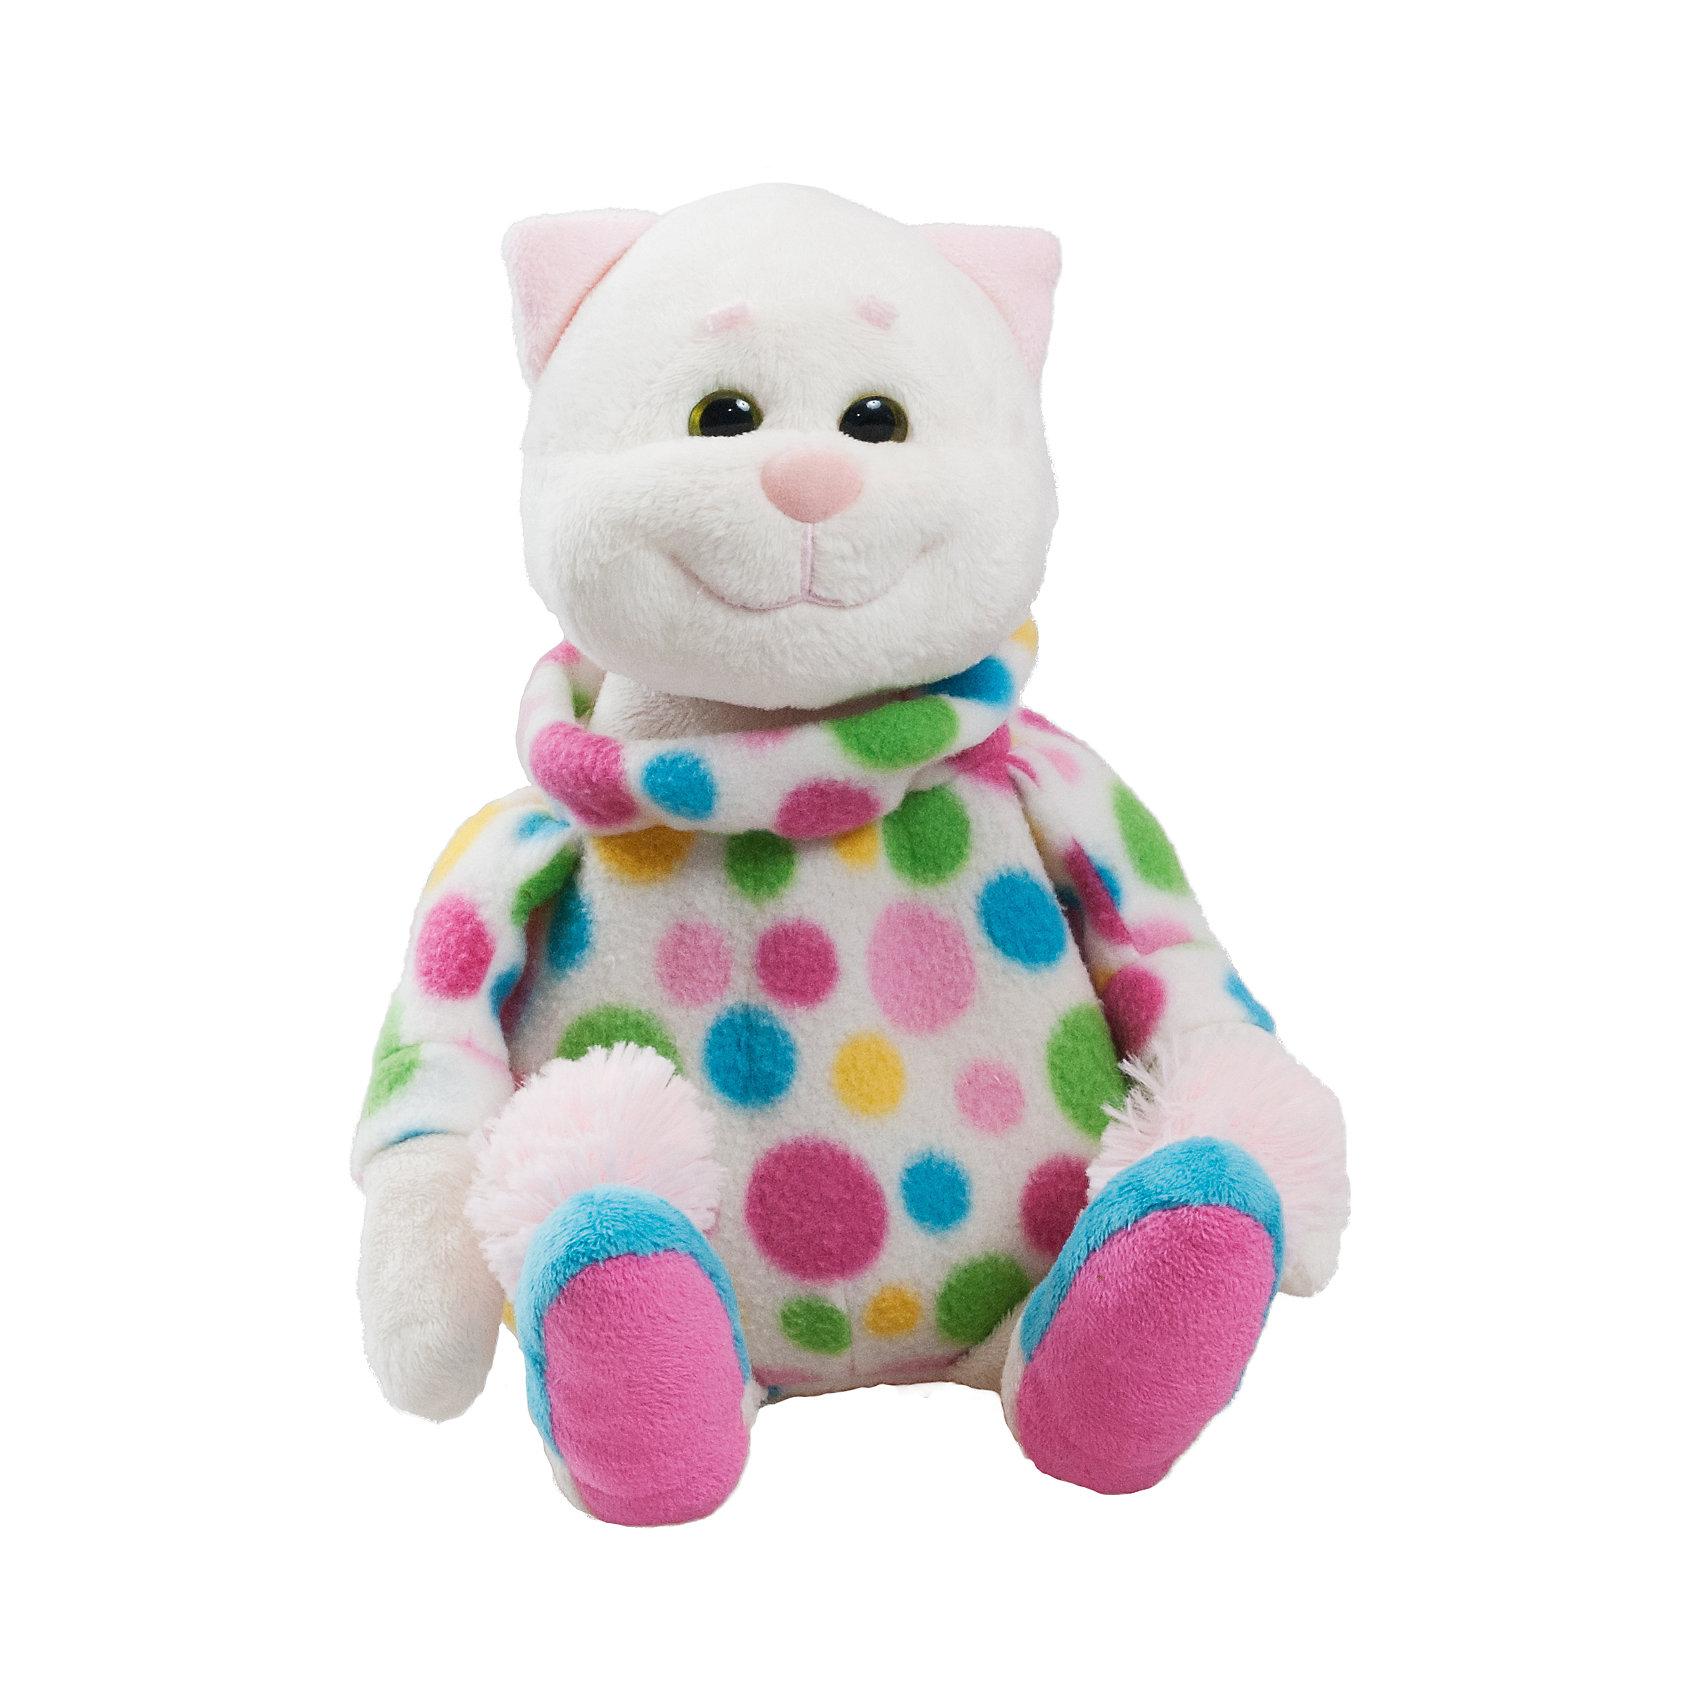 Мягкая игрушка Котик-грелка, Fancy<br><br>Ширина мм: 170<br>Глубина мм: 210<br>Высота мм: 290<br>Вес г: 465<br>Возраст от месяцев: 36<br>Возраст до месяцев: 96<br>Пол: Унисекс<br>Возраст: Детский<br>SKU: 4318187